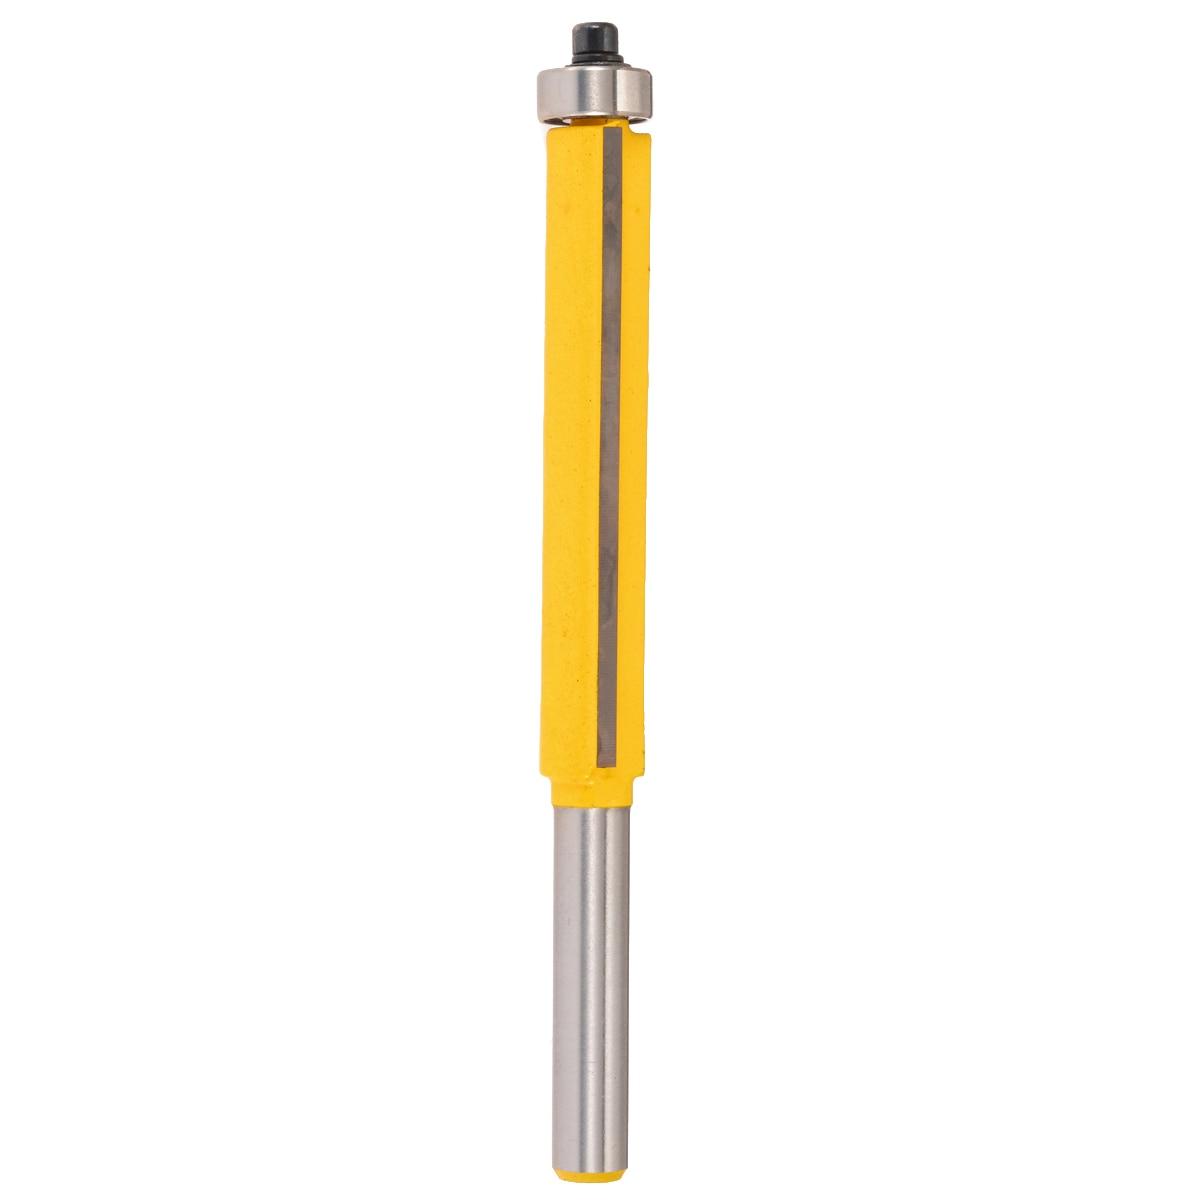 "6mm Flush Trim Bit 1//4/"" Shank Router Bit Bearing Cutting Edge Woodworking Tool"